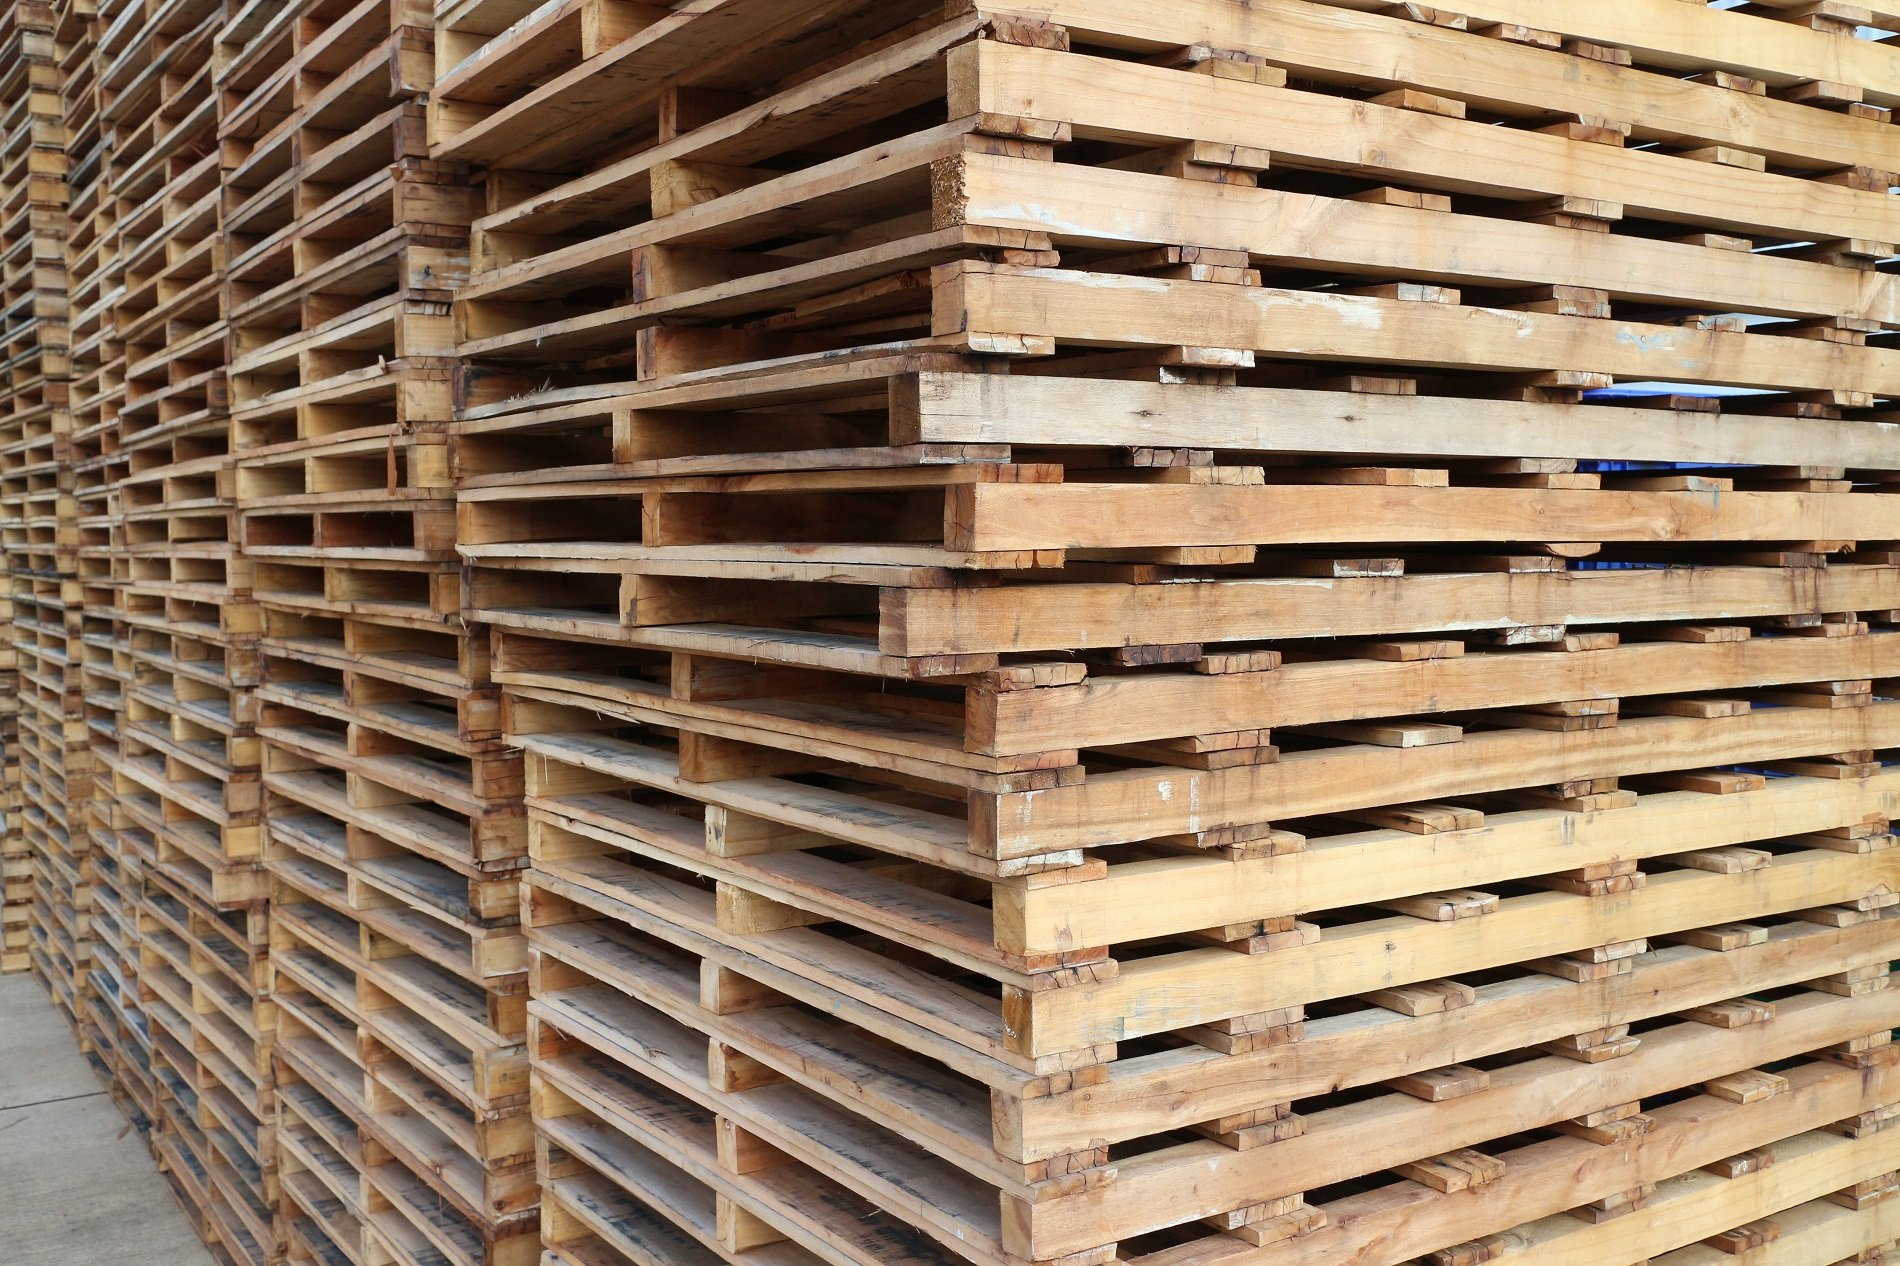 dei pallet in legno